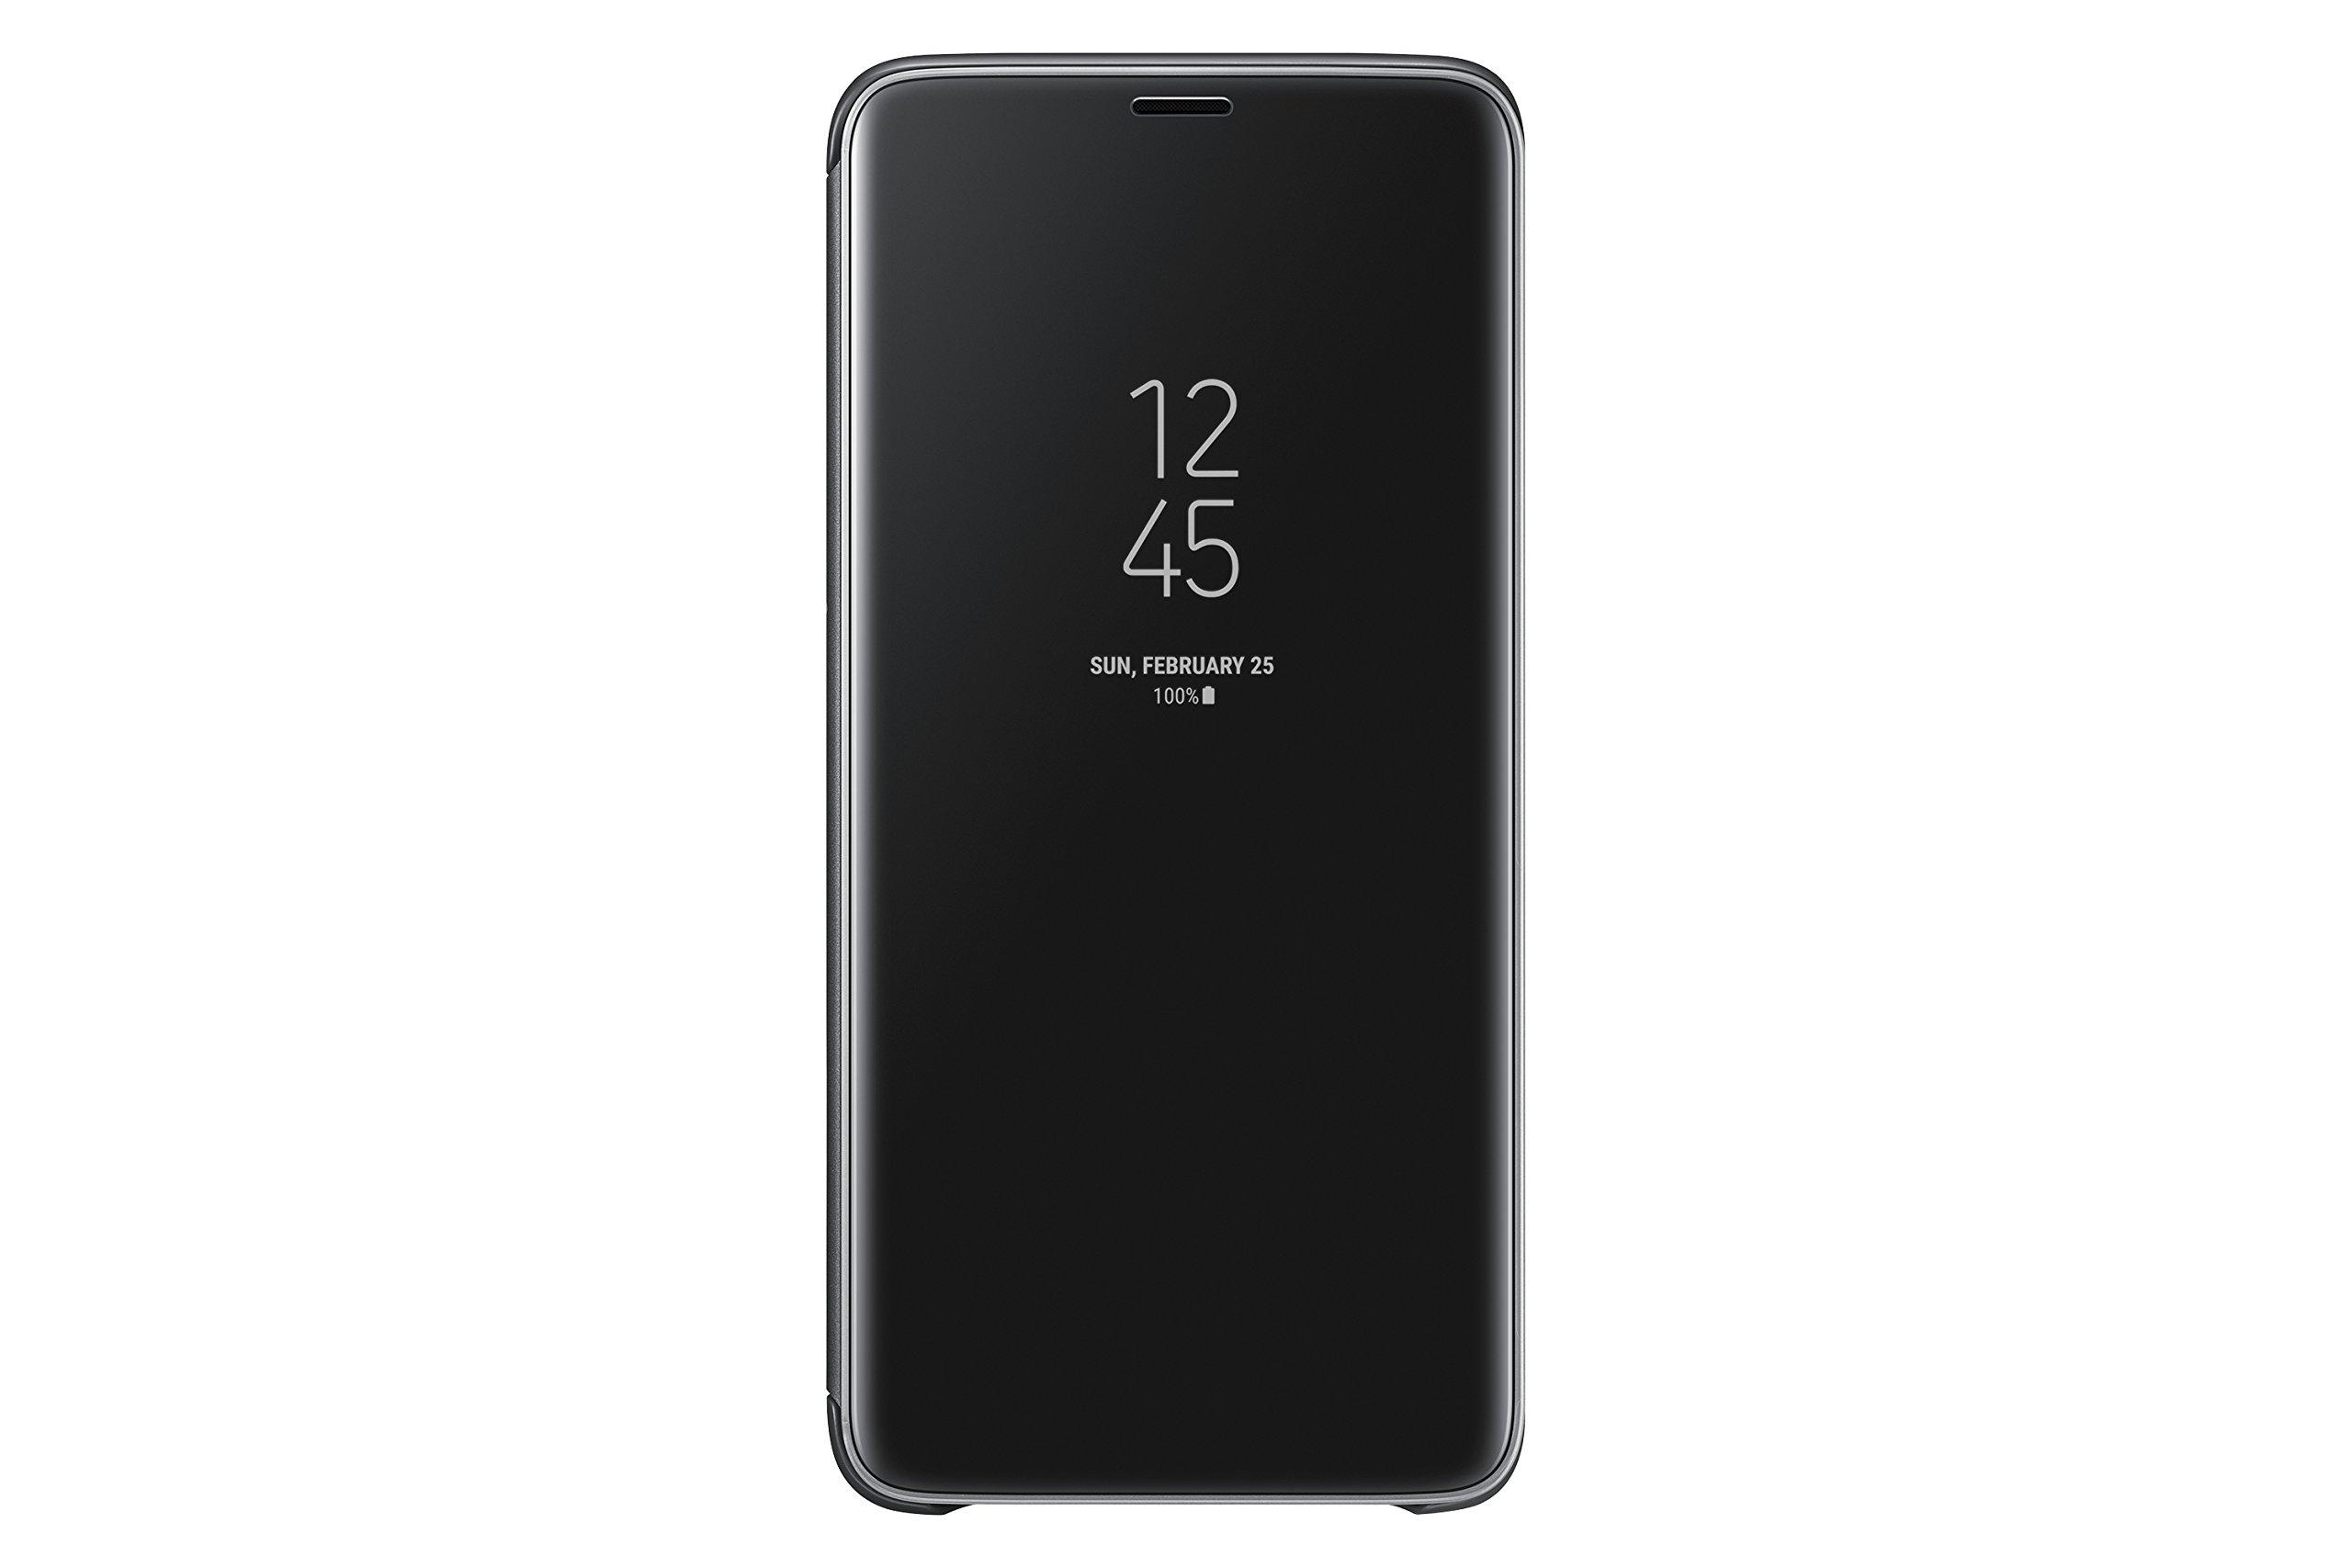 Samsung Galaxy S9+ S-View Flip Case with Kickstand, Black by Samsung